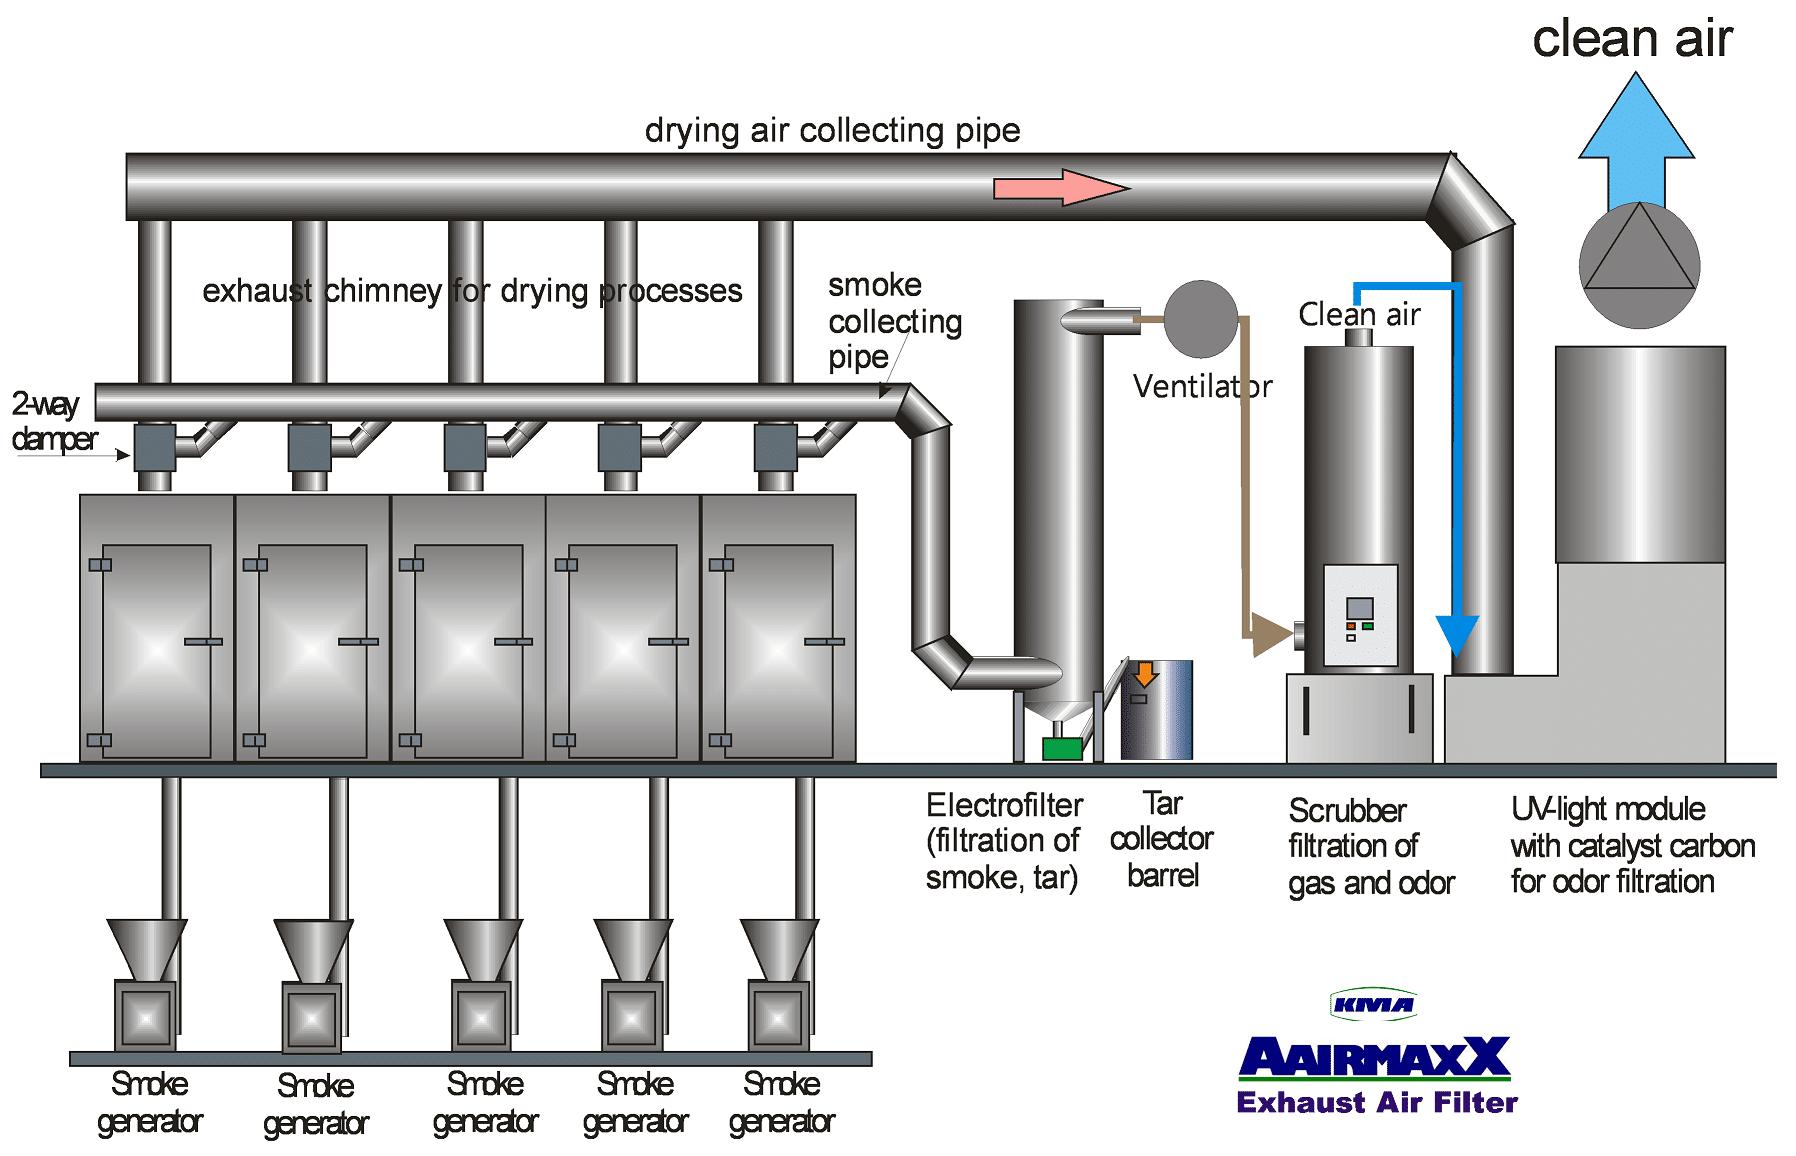 illustration-kma-hybrid-air-filter-systems-for-smoke-houses